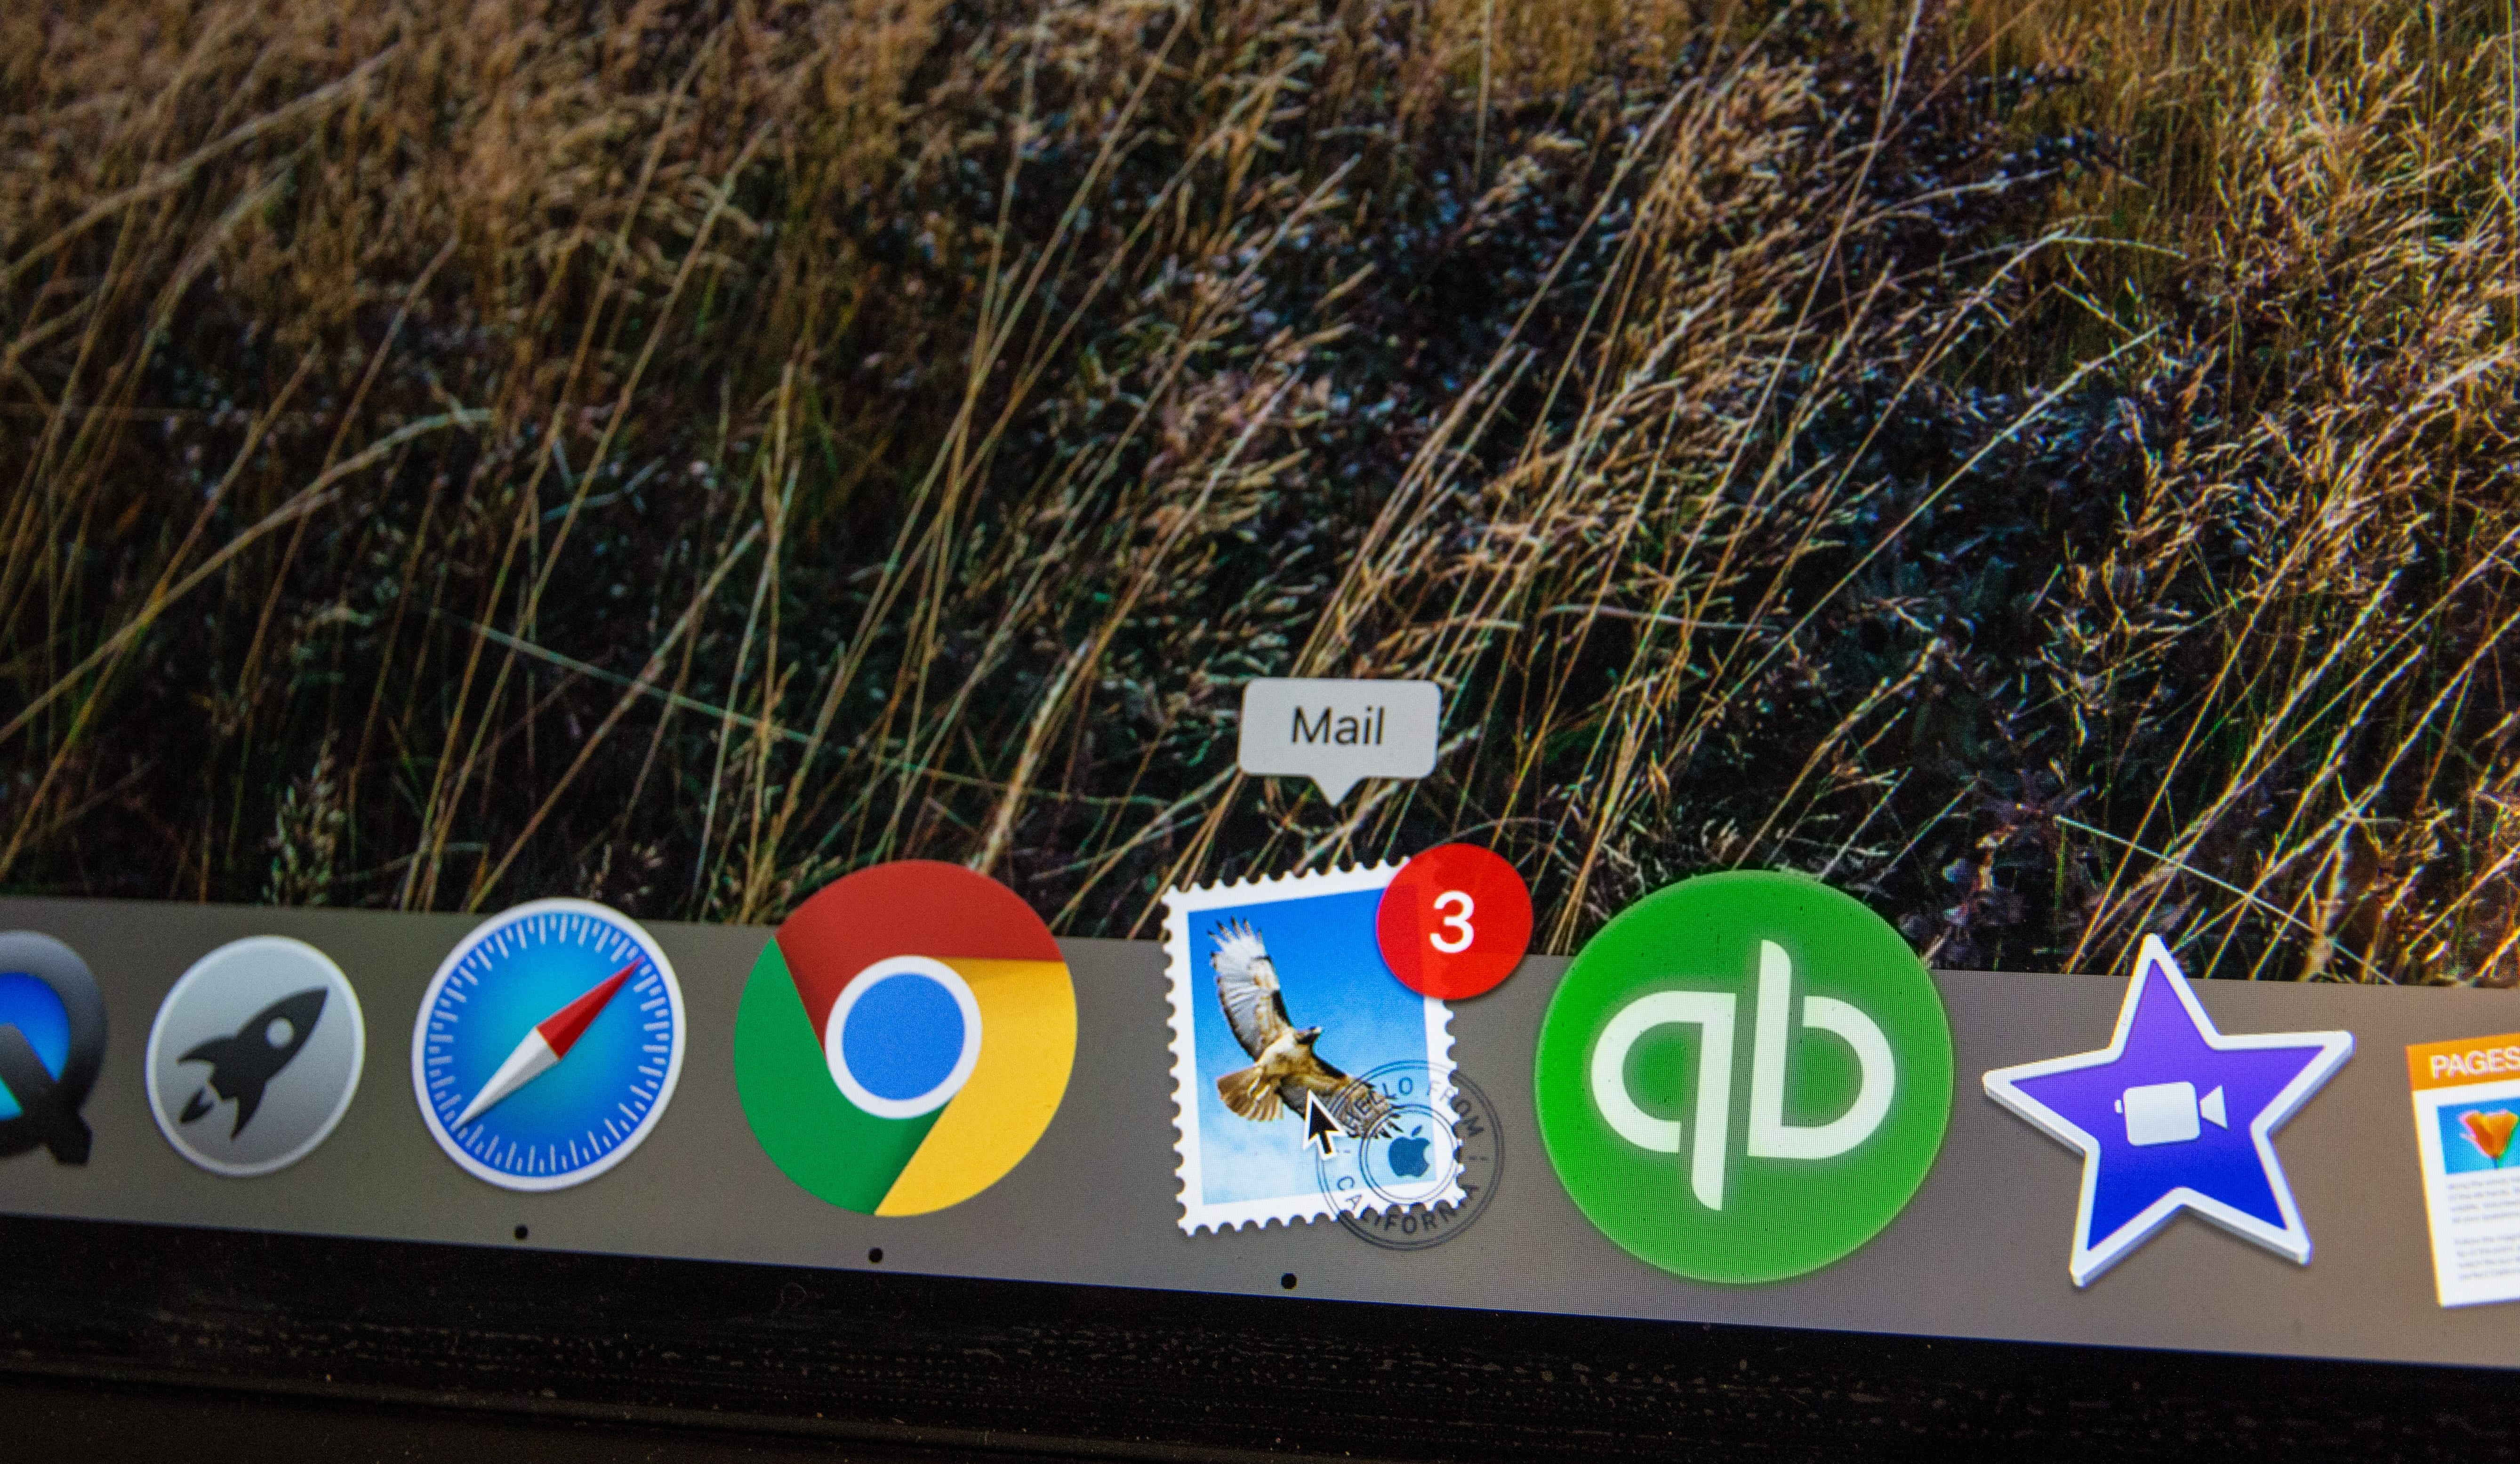 Email icon in Mac dock; image by webaroo.com.au, via Unsplash.com.